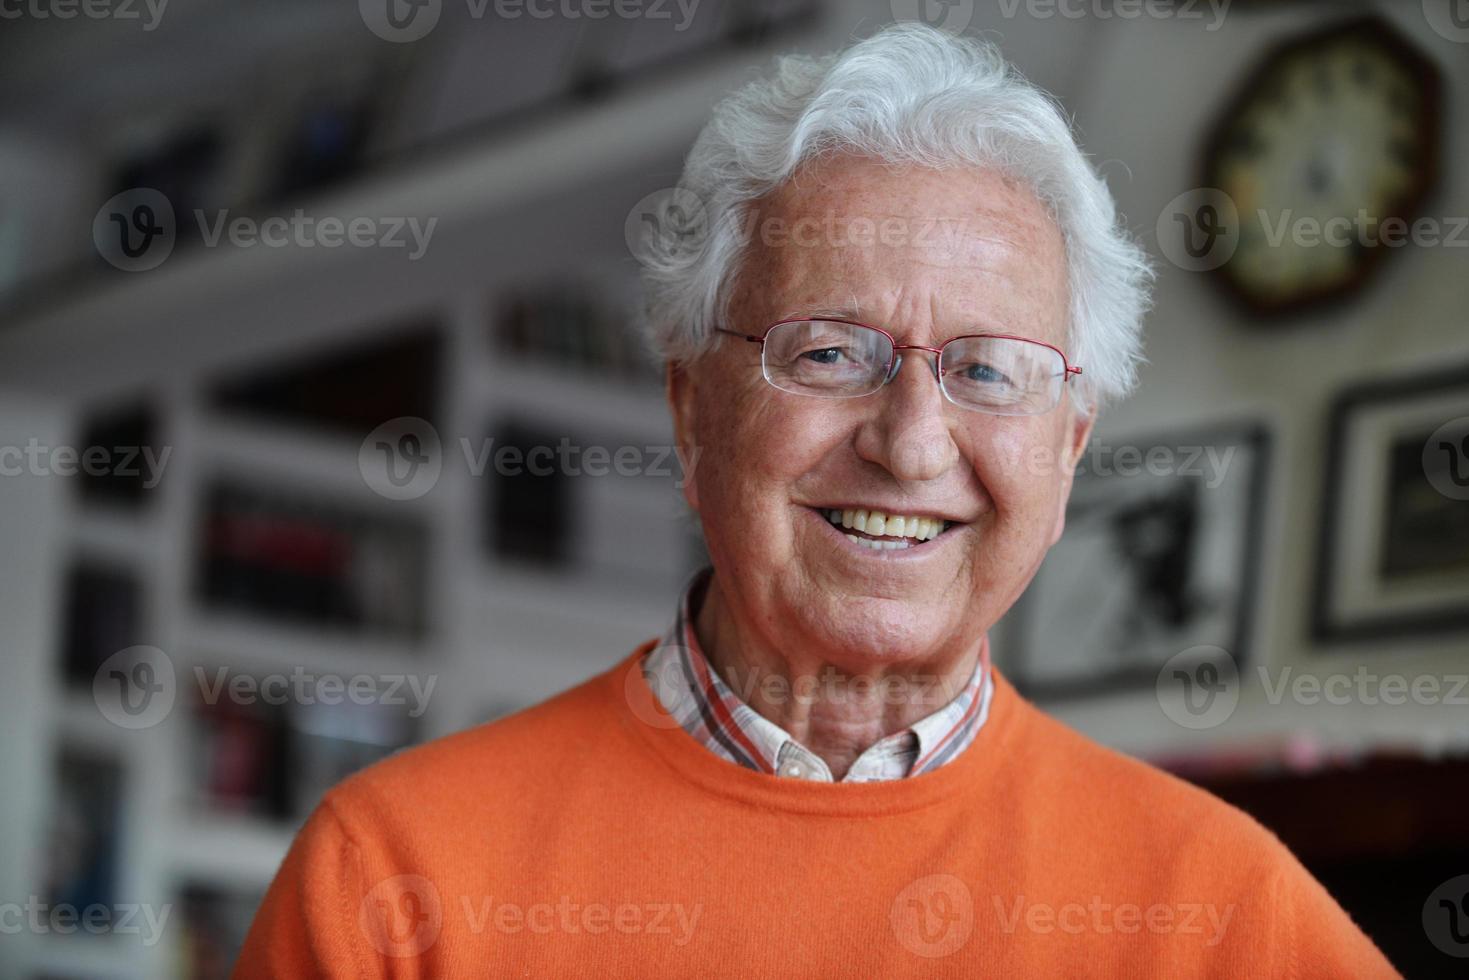 Mature man smiling photo